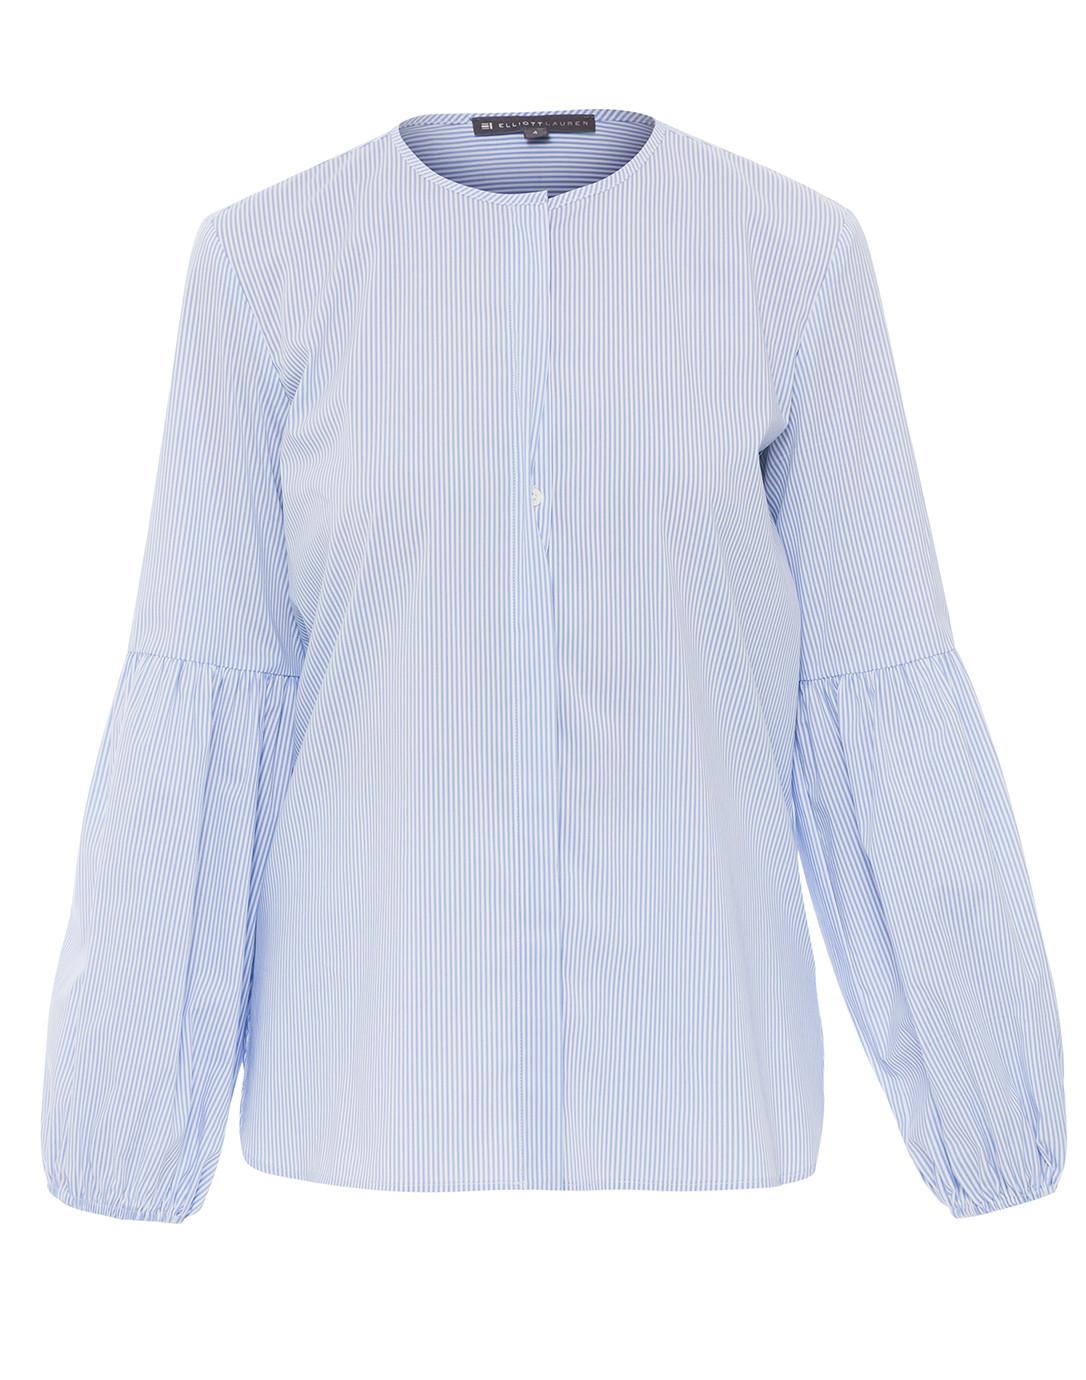 Blue And White Striped Billow Sleeve Shirt Elliott